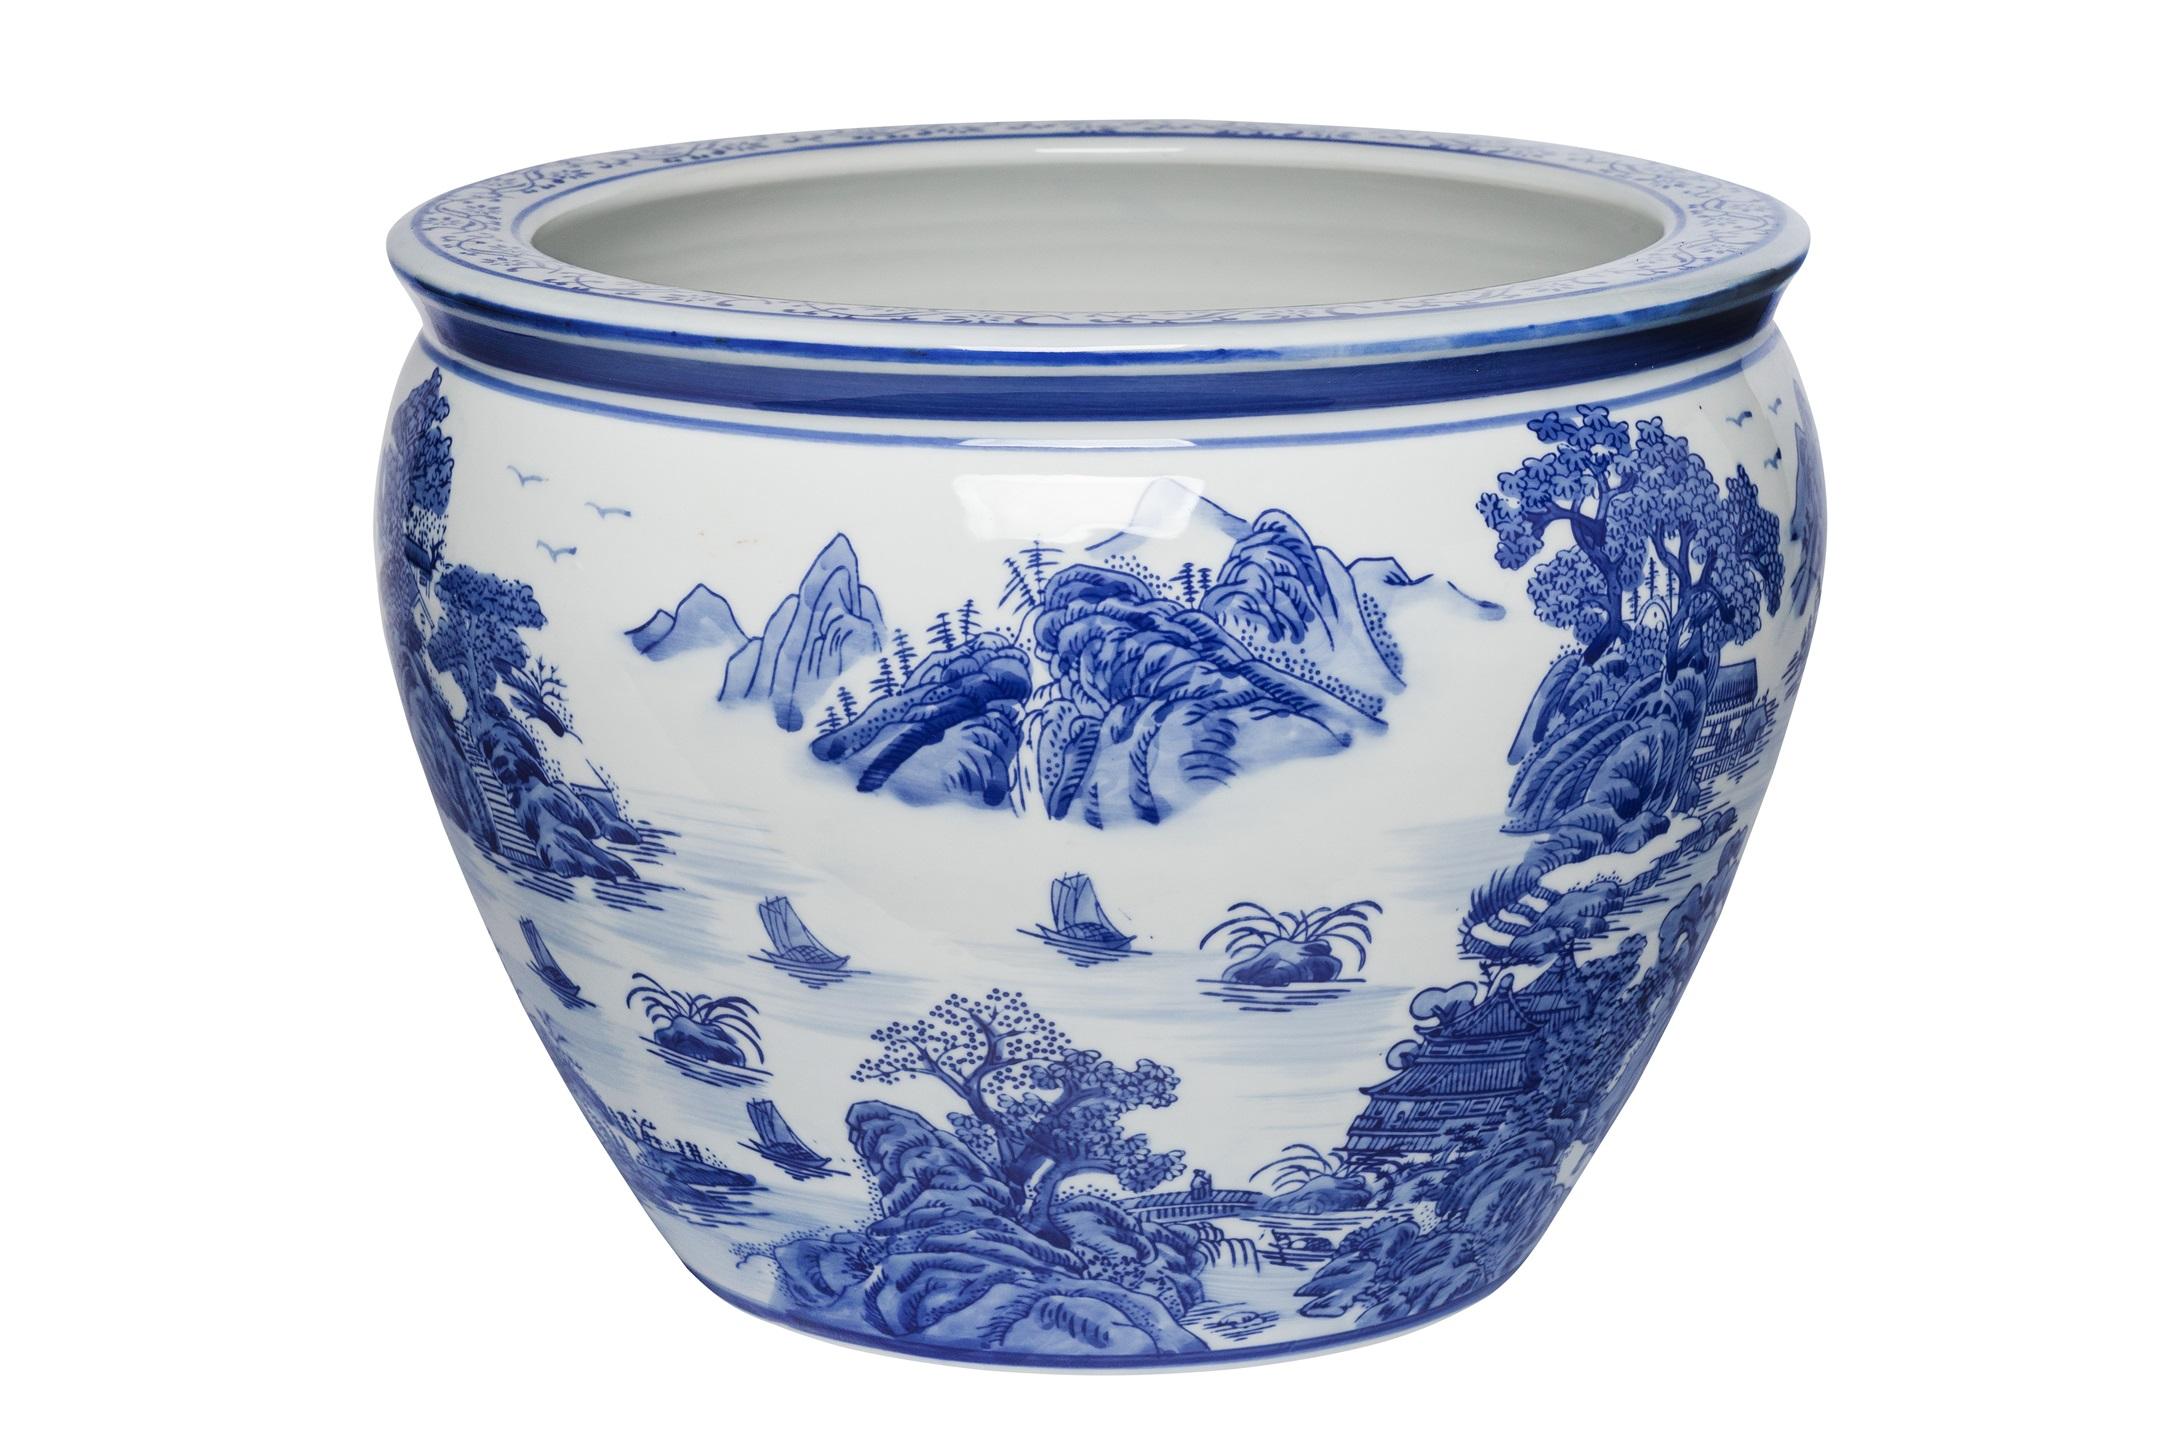 Cachepot cerâmica azul e branca